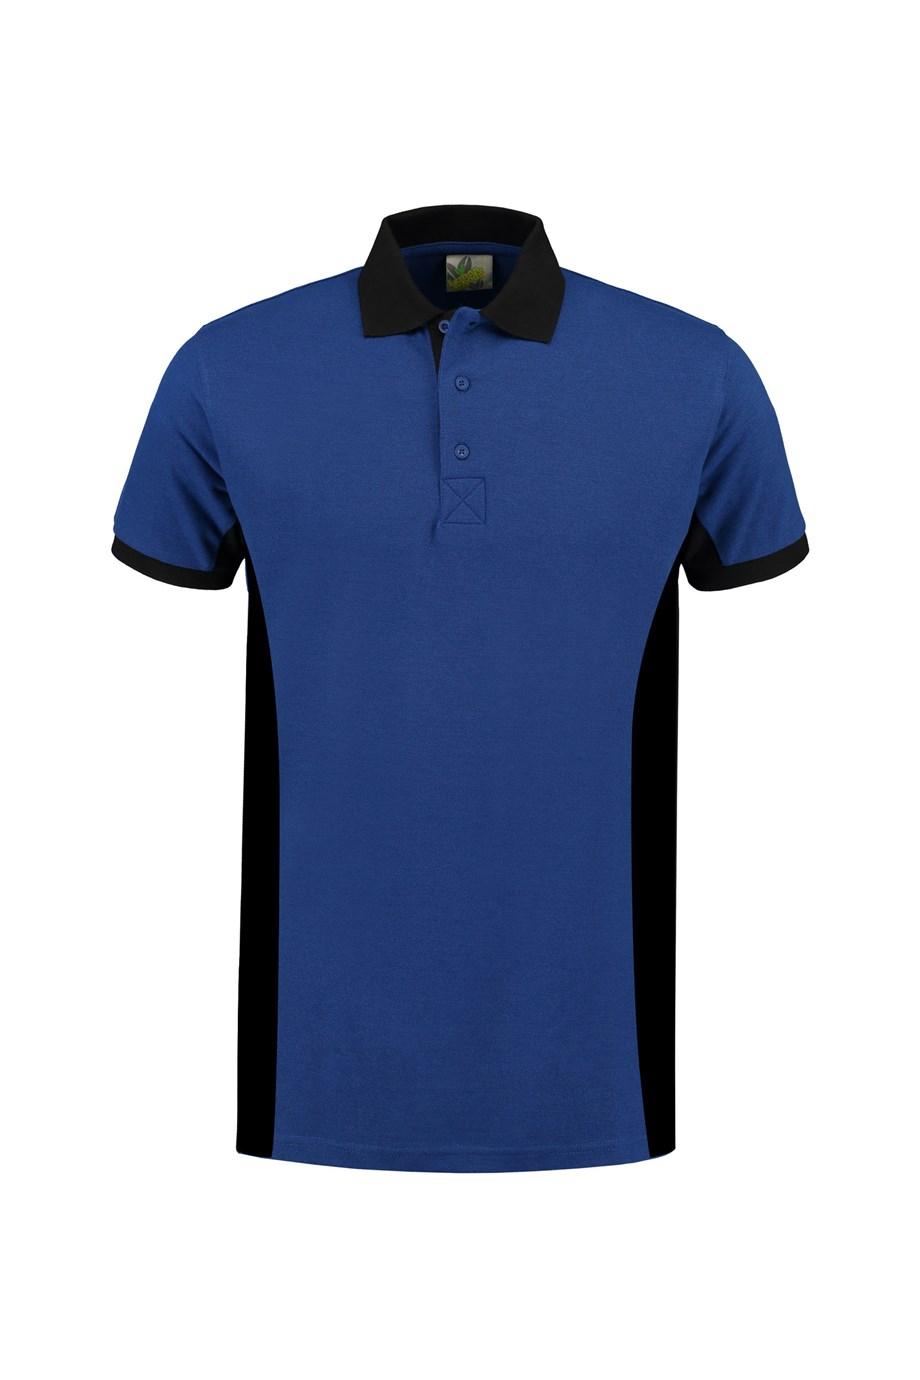 royal blue - black